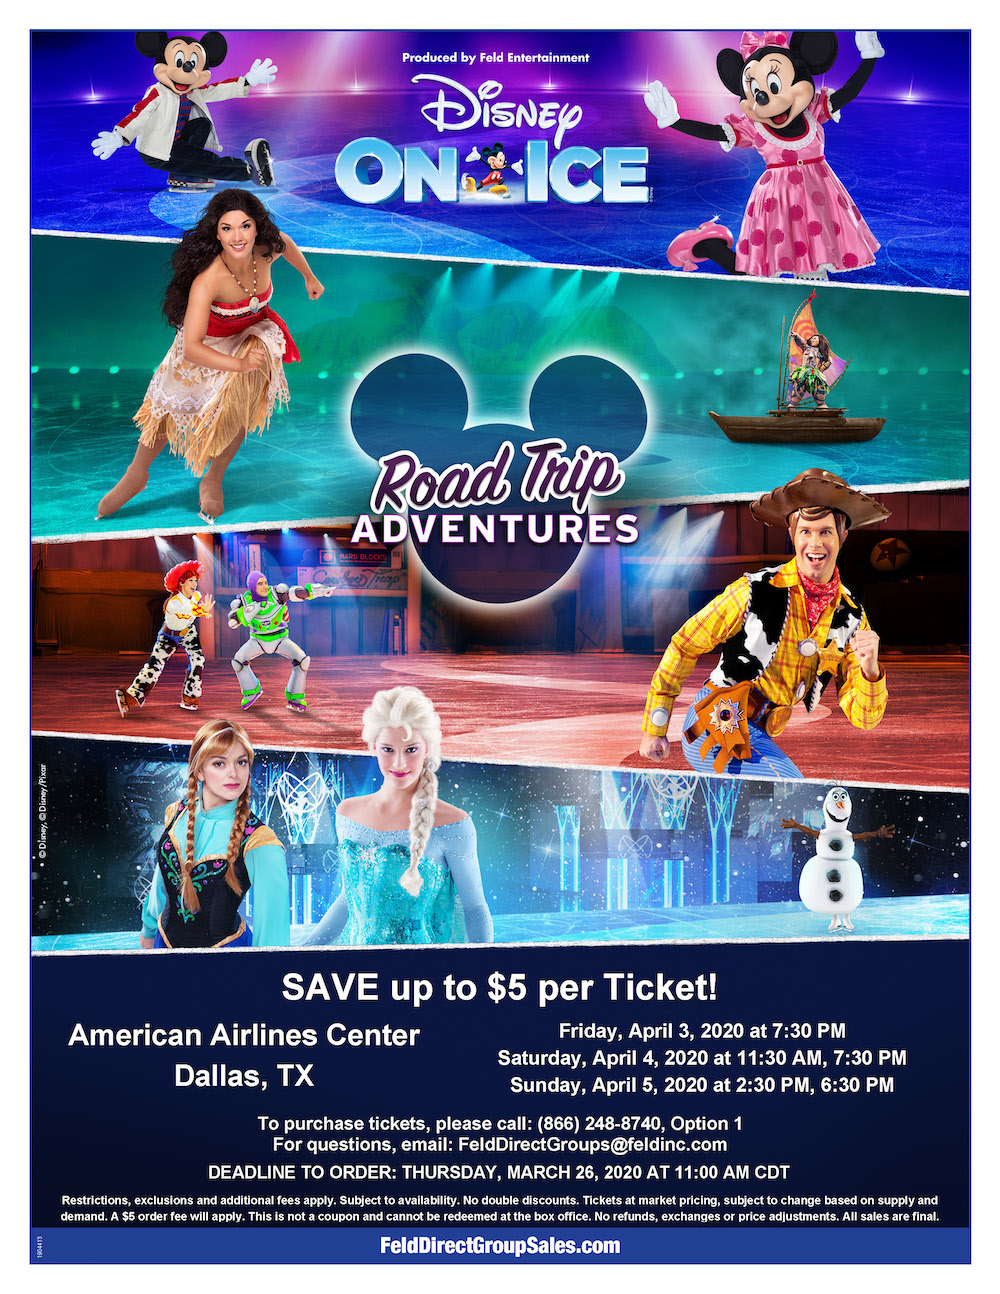 Disney on Ice Road Trip to Adventures